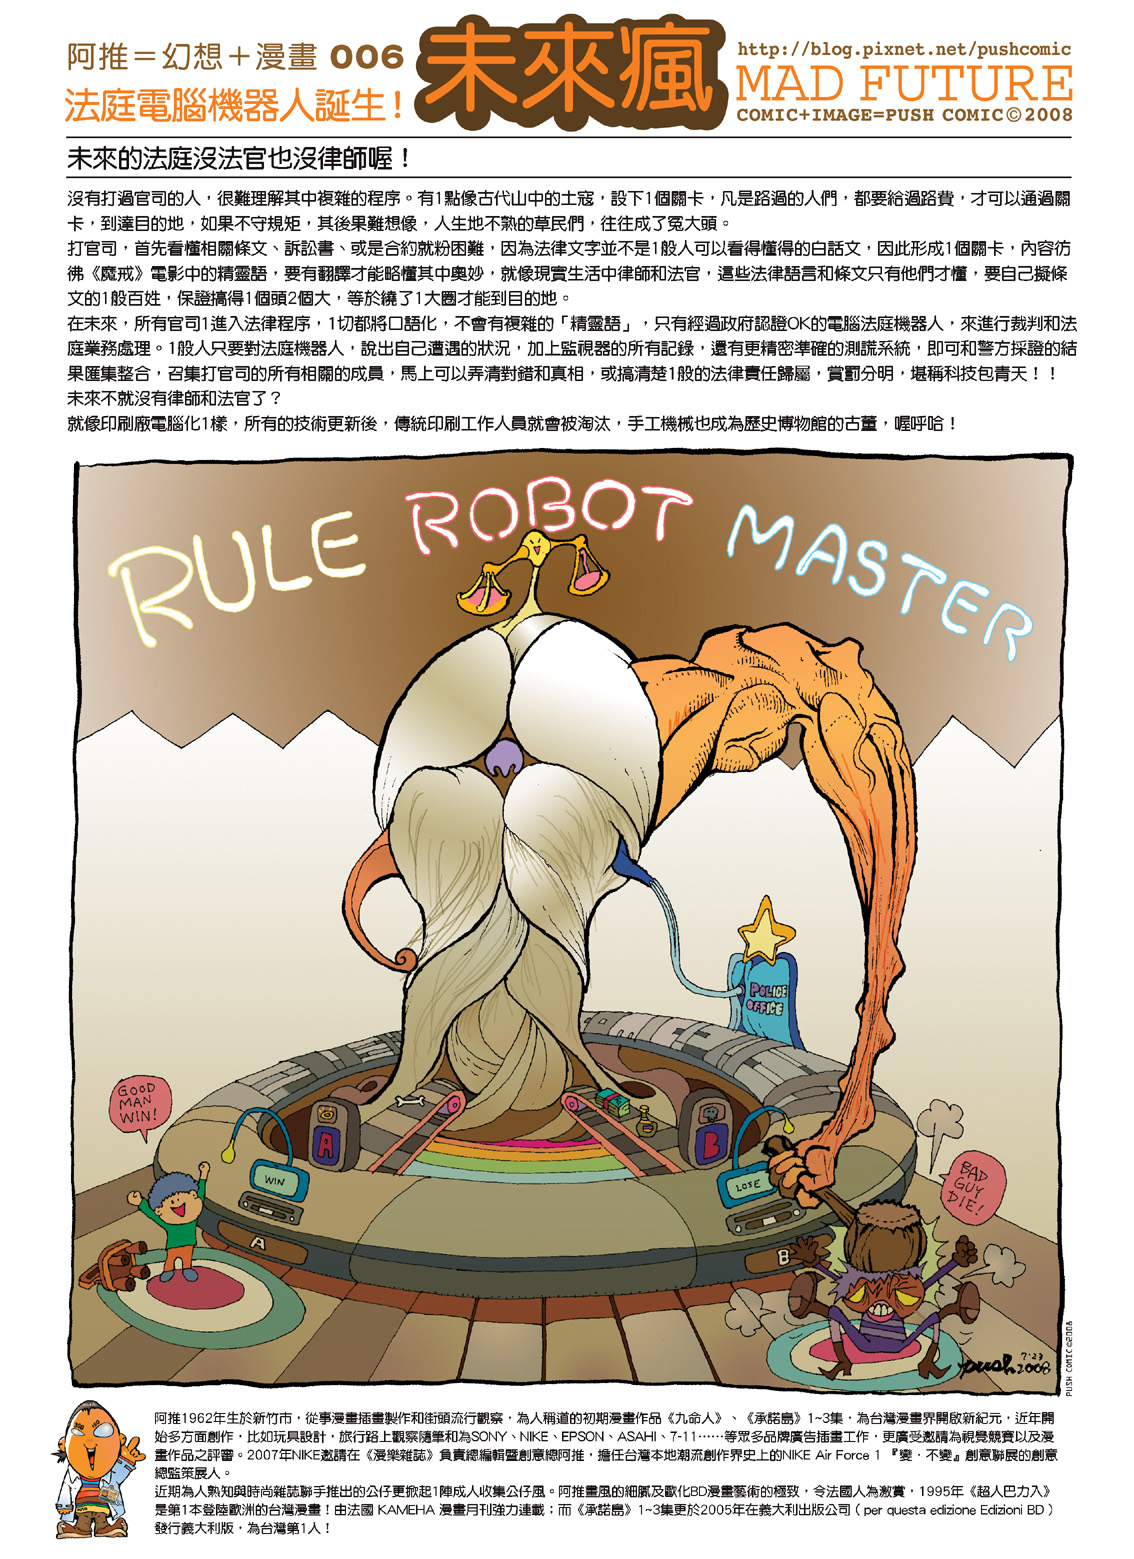 Ming-006-MF-byPUSH-S.jpg